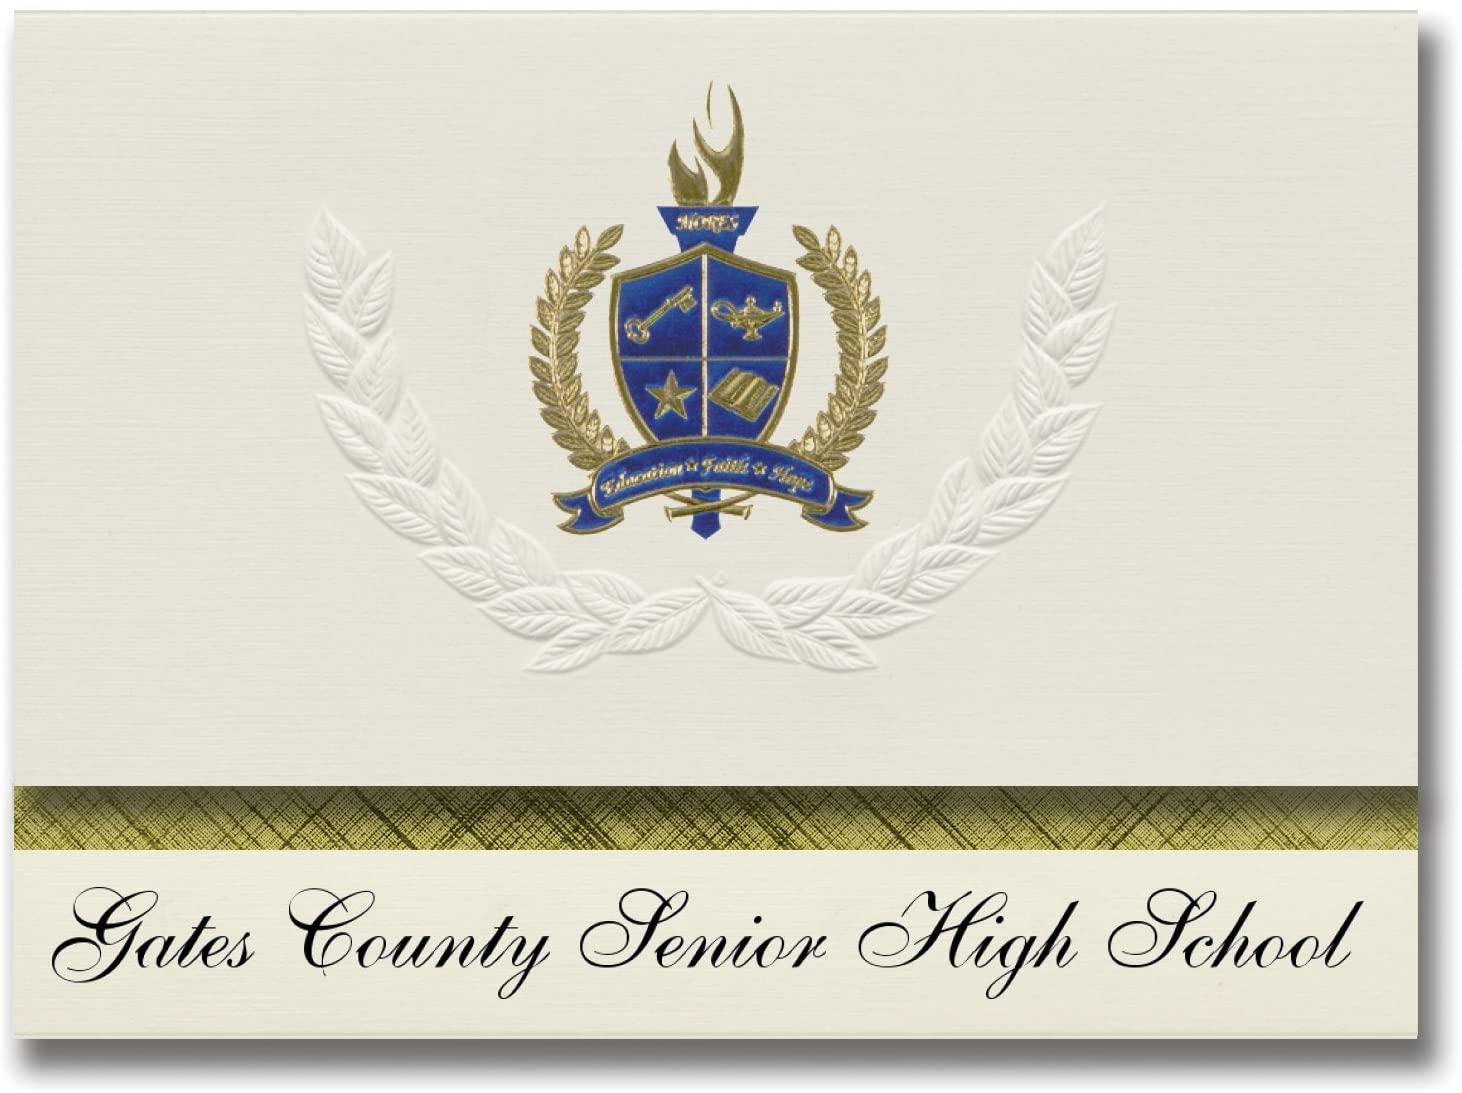 Signature Announcements Gates County Senior High School (Gatesville, NC) Graduation Announcements, Presidential Basic Pack 25 with Gold & Blue Metallic Foil seal